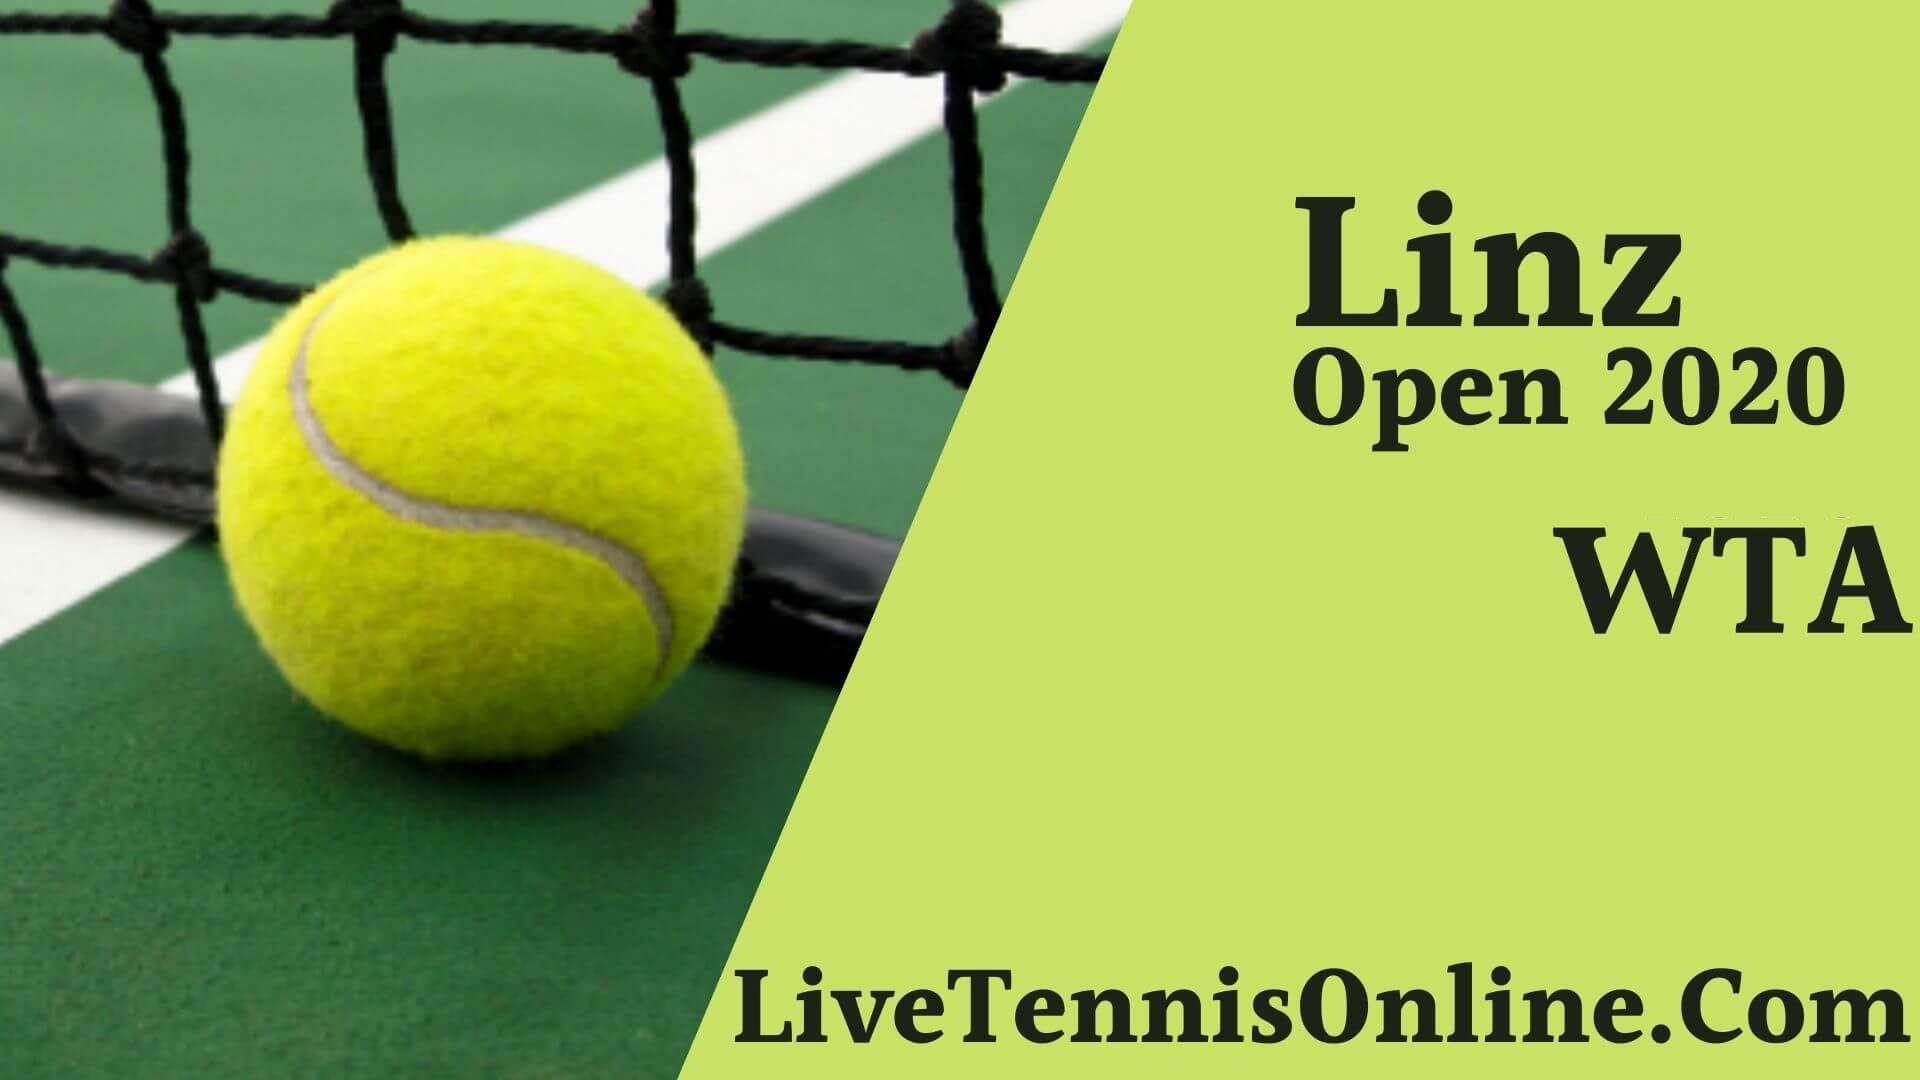 2018 Upper Austria Ladies Linz Live Online